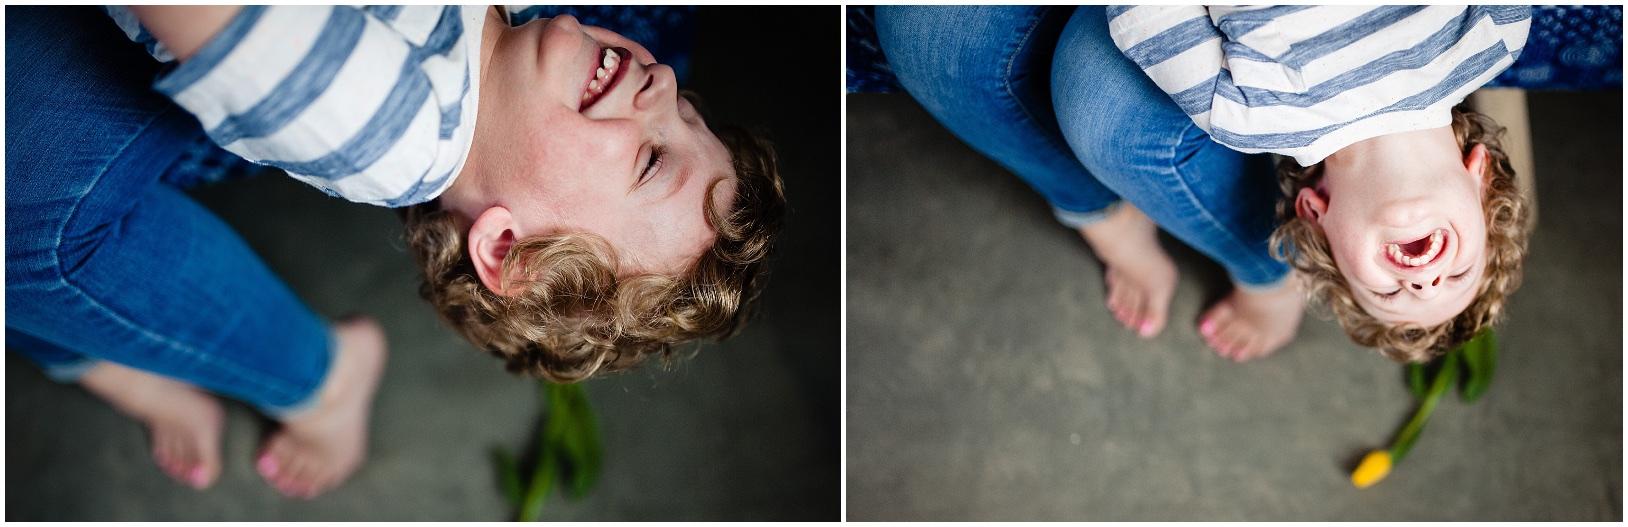 lindseyjanephotography_portraits011.jpg